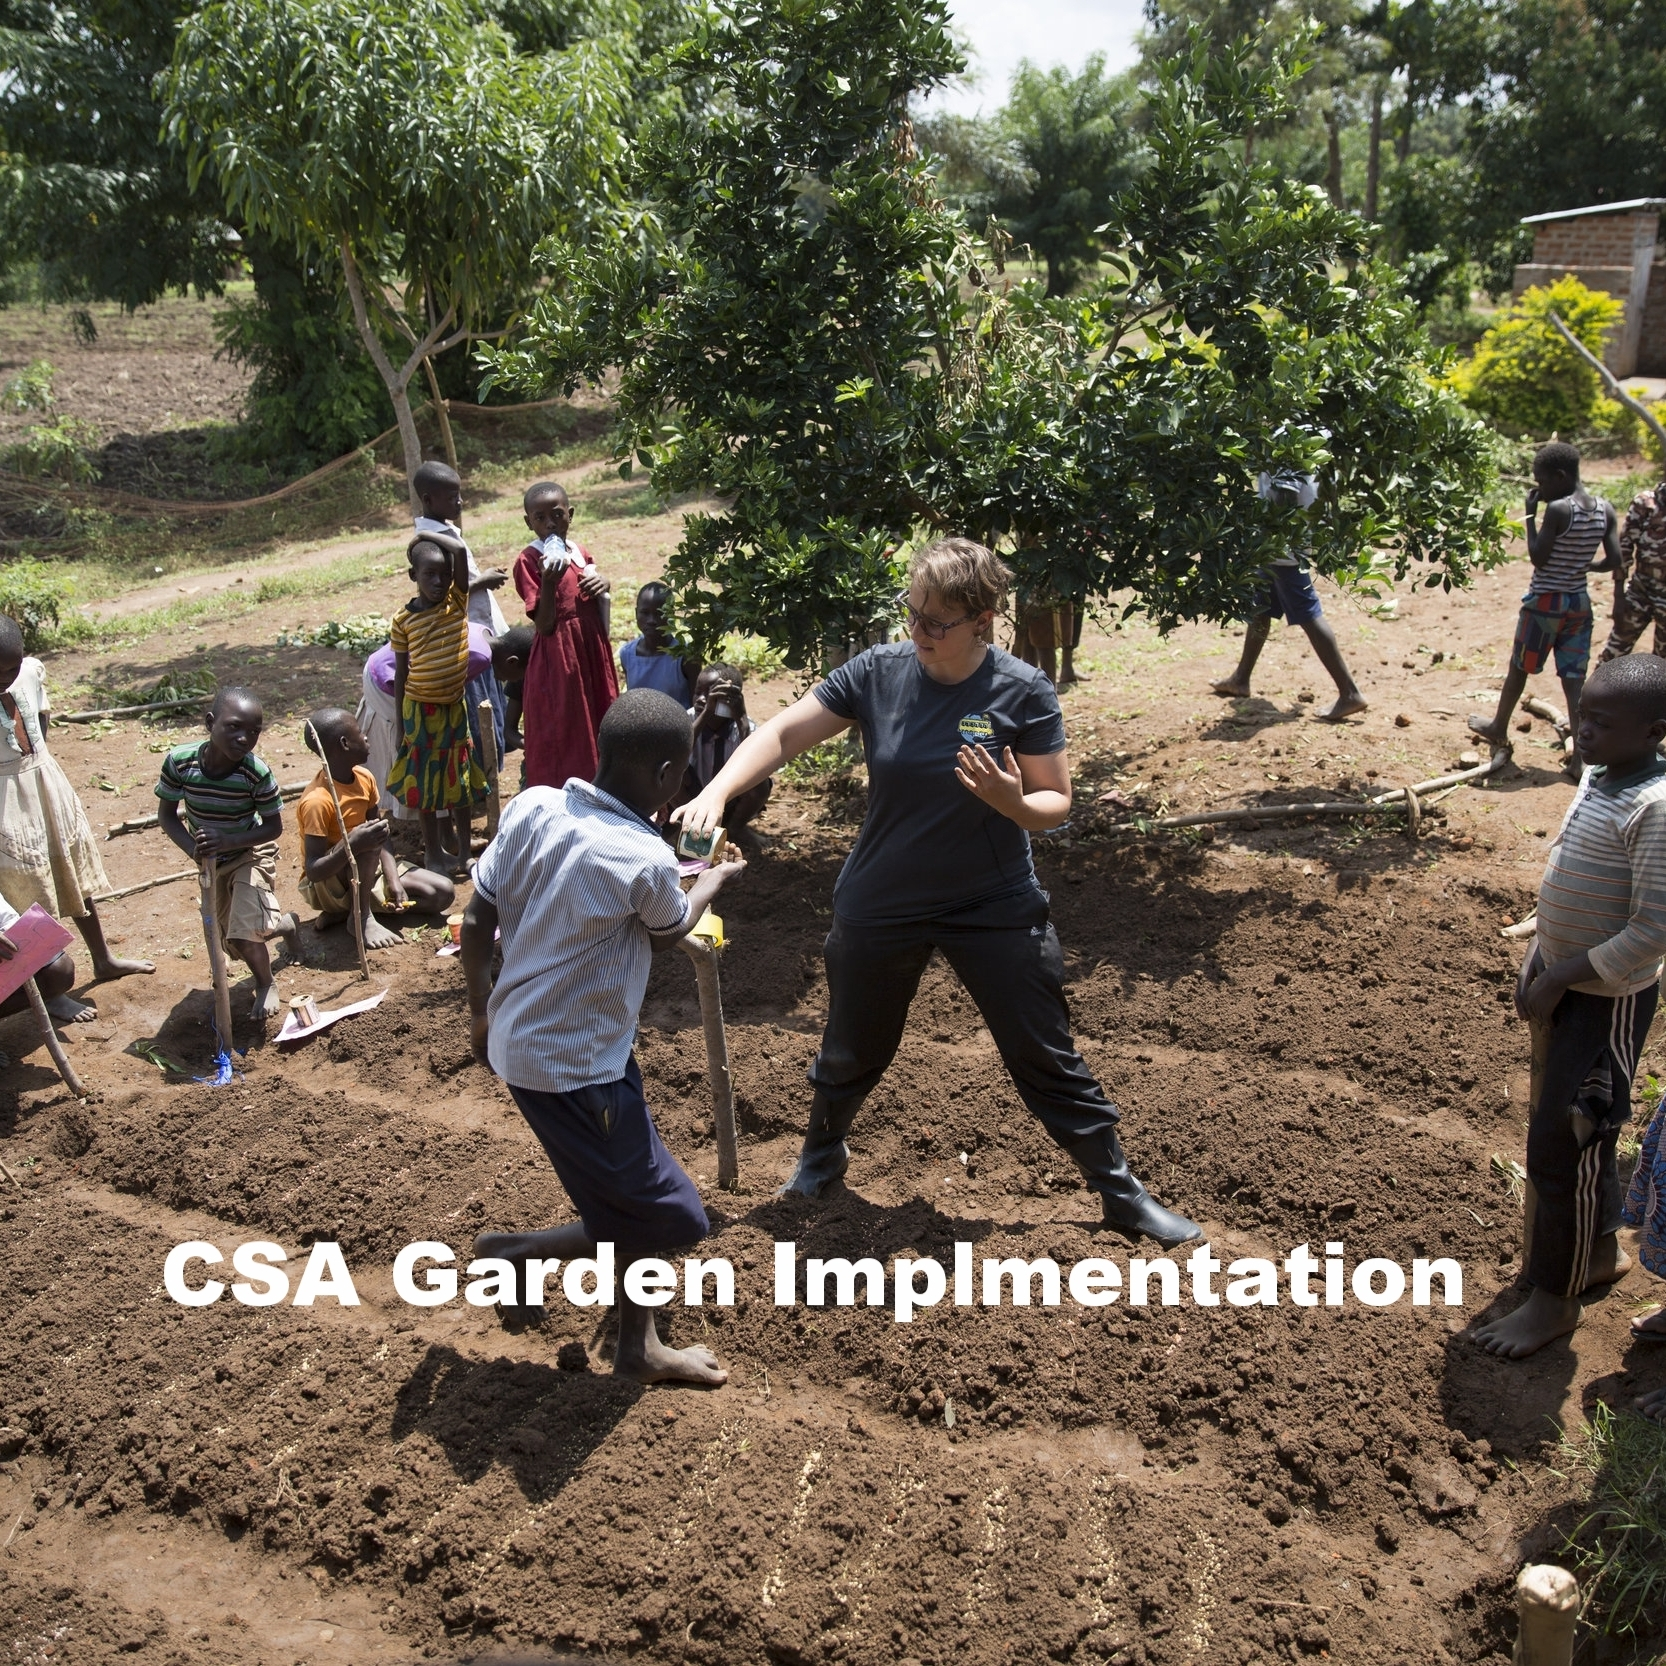 CSA Garden Implementation